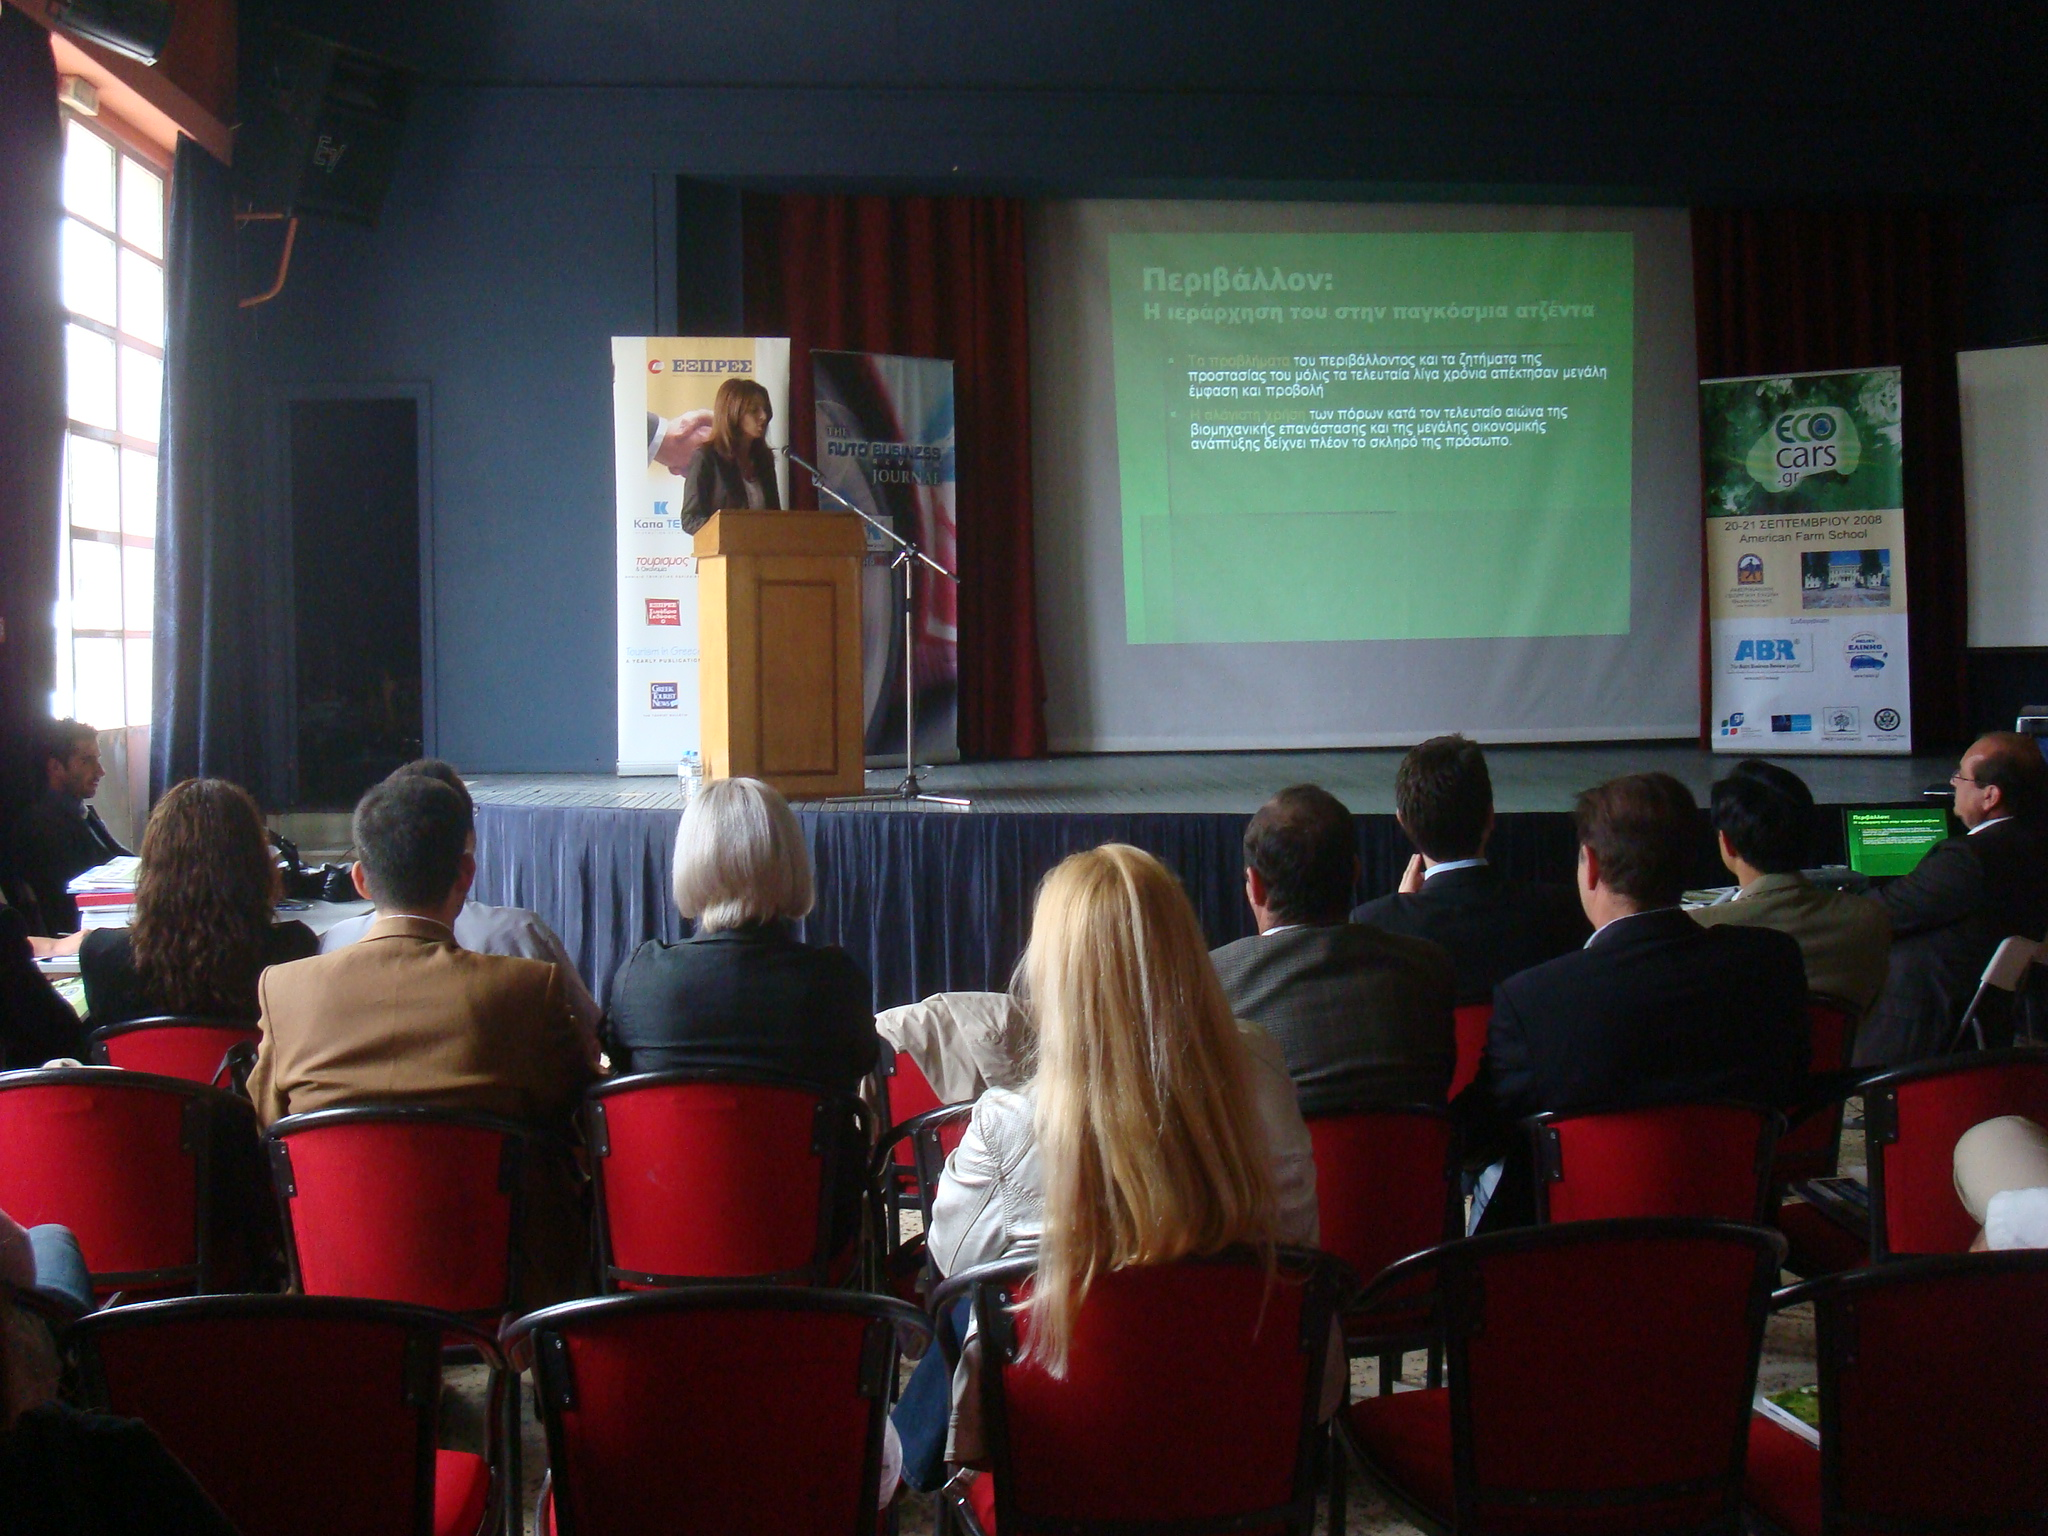 EcoCars 2008 – Green Entrepreneurship: Need or opportunity?